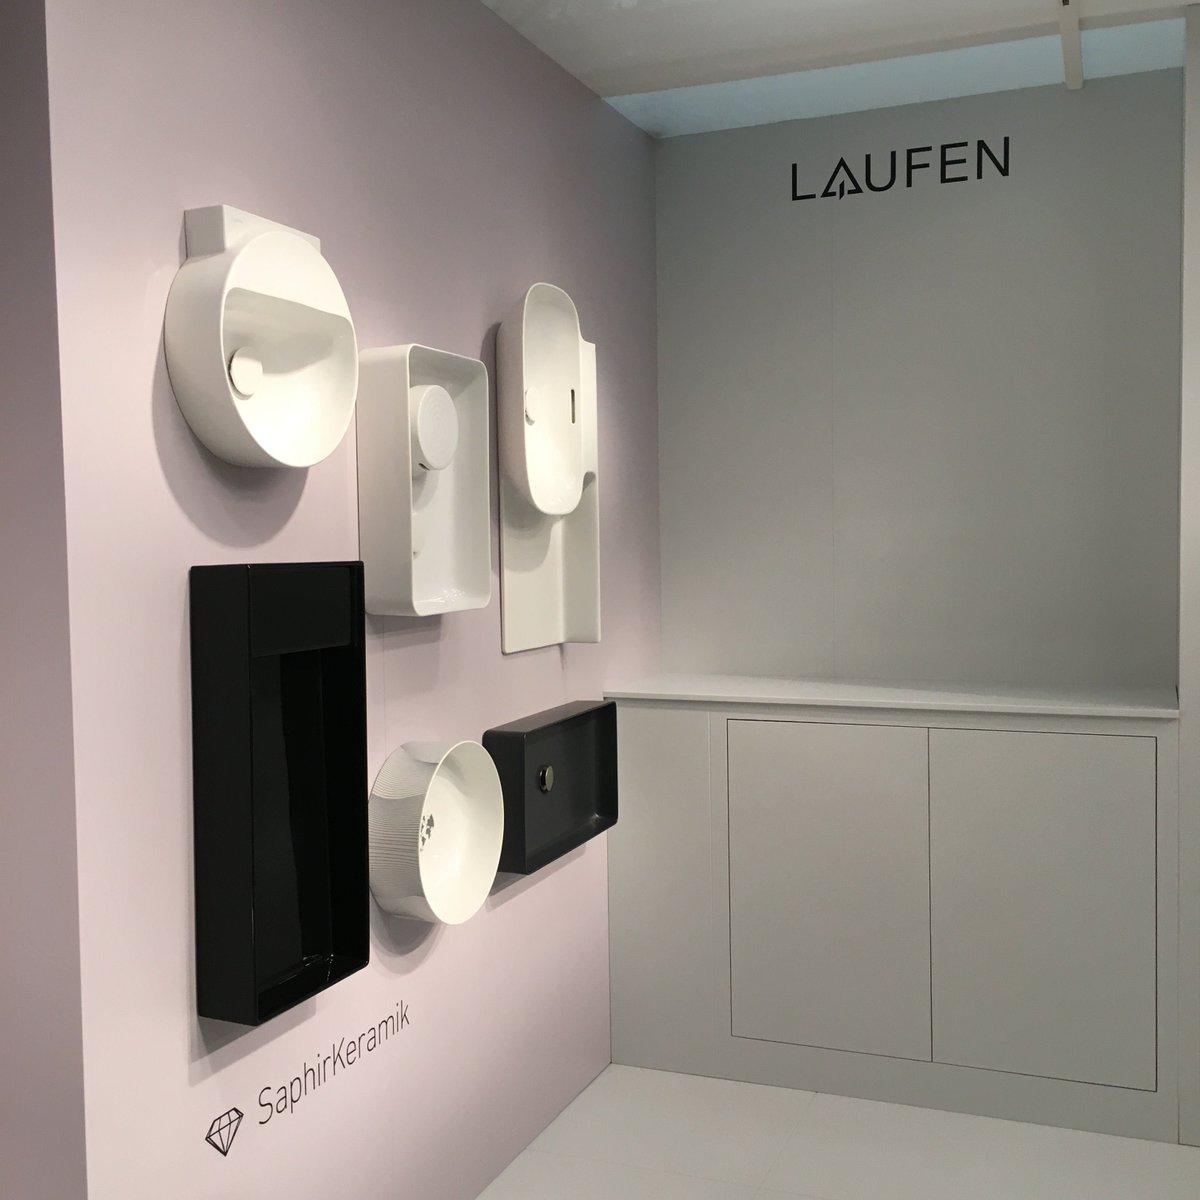 The latest in bathroom innovation from @LaufenBathrooms on their stand @sleepevent #saphirkeramic #bathroomdesign <br>http://pic.twitter.com/rXufaj1rMn